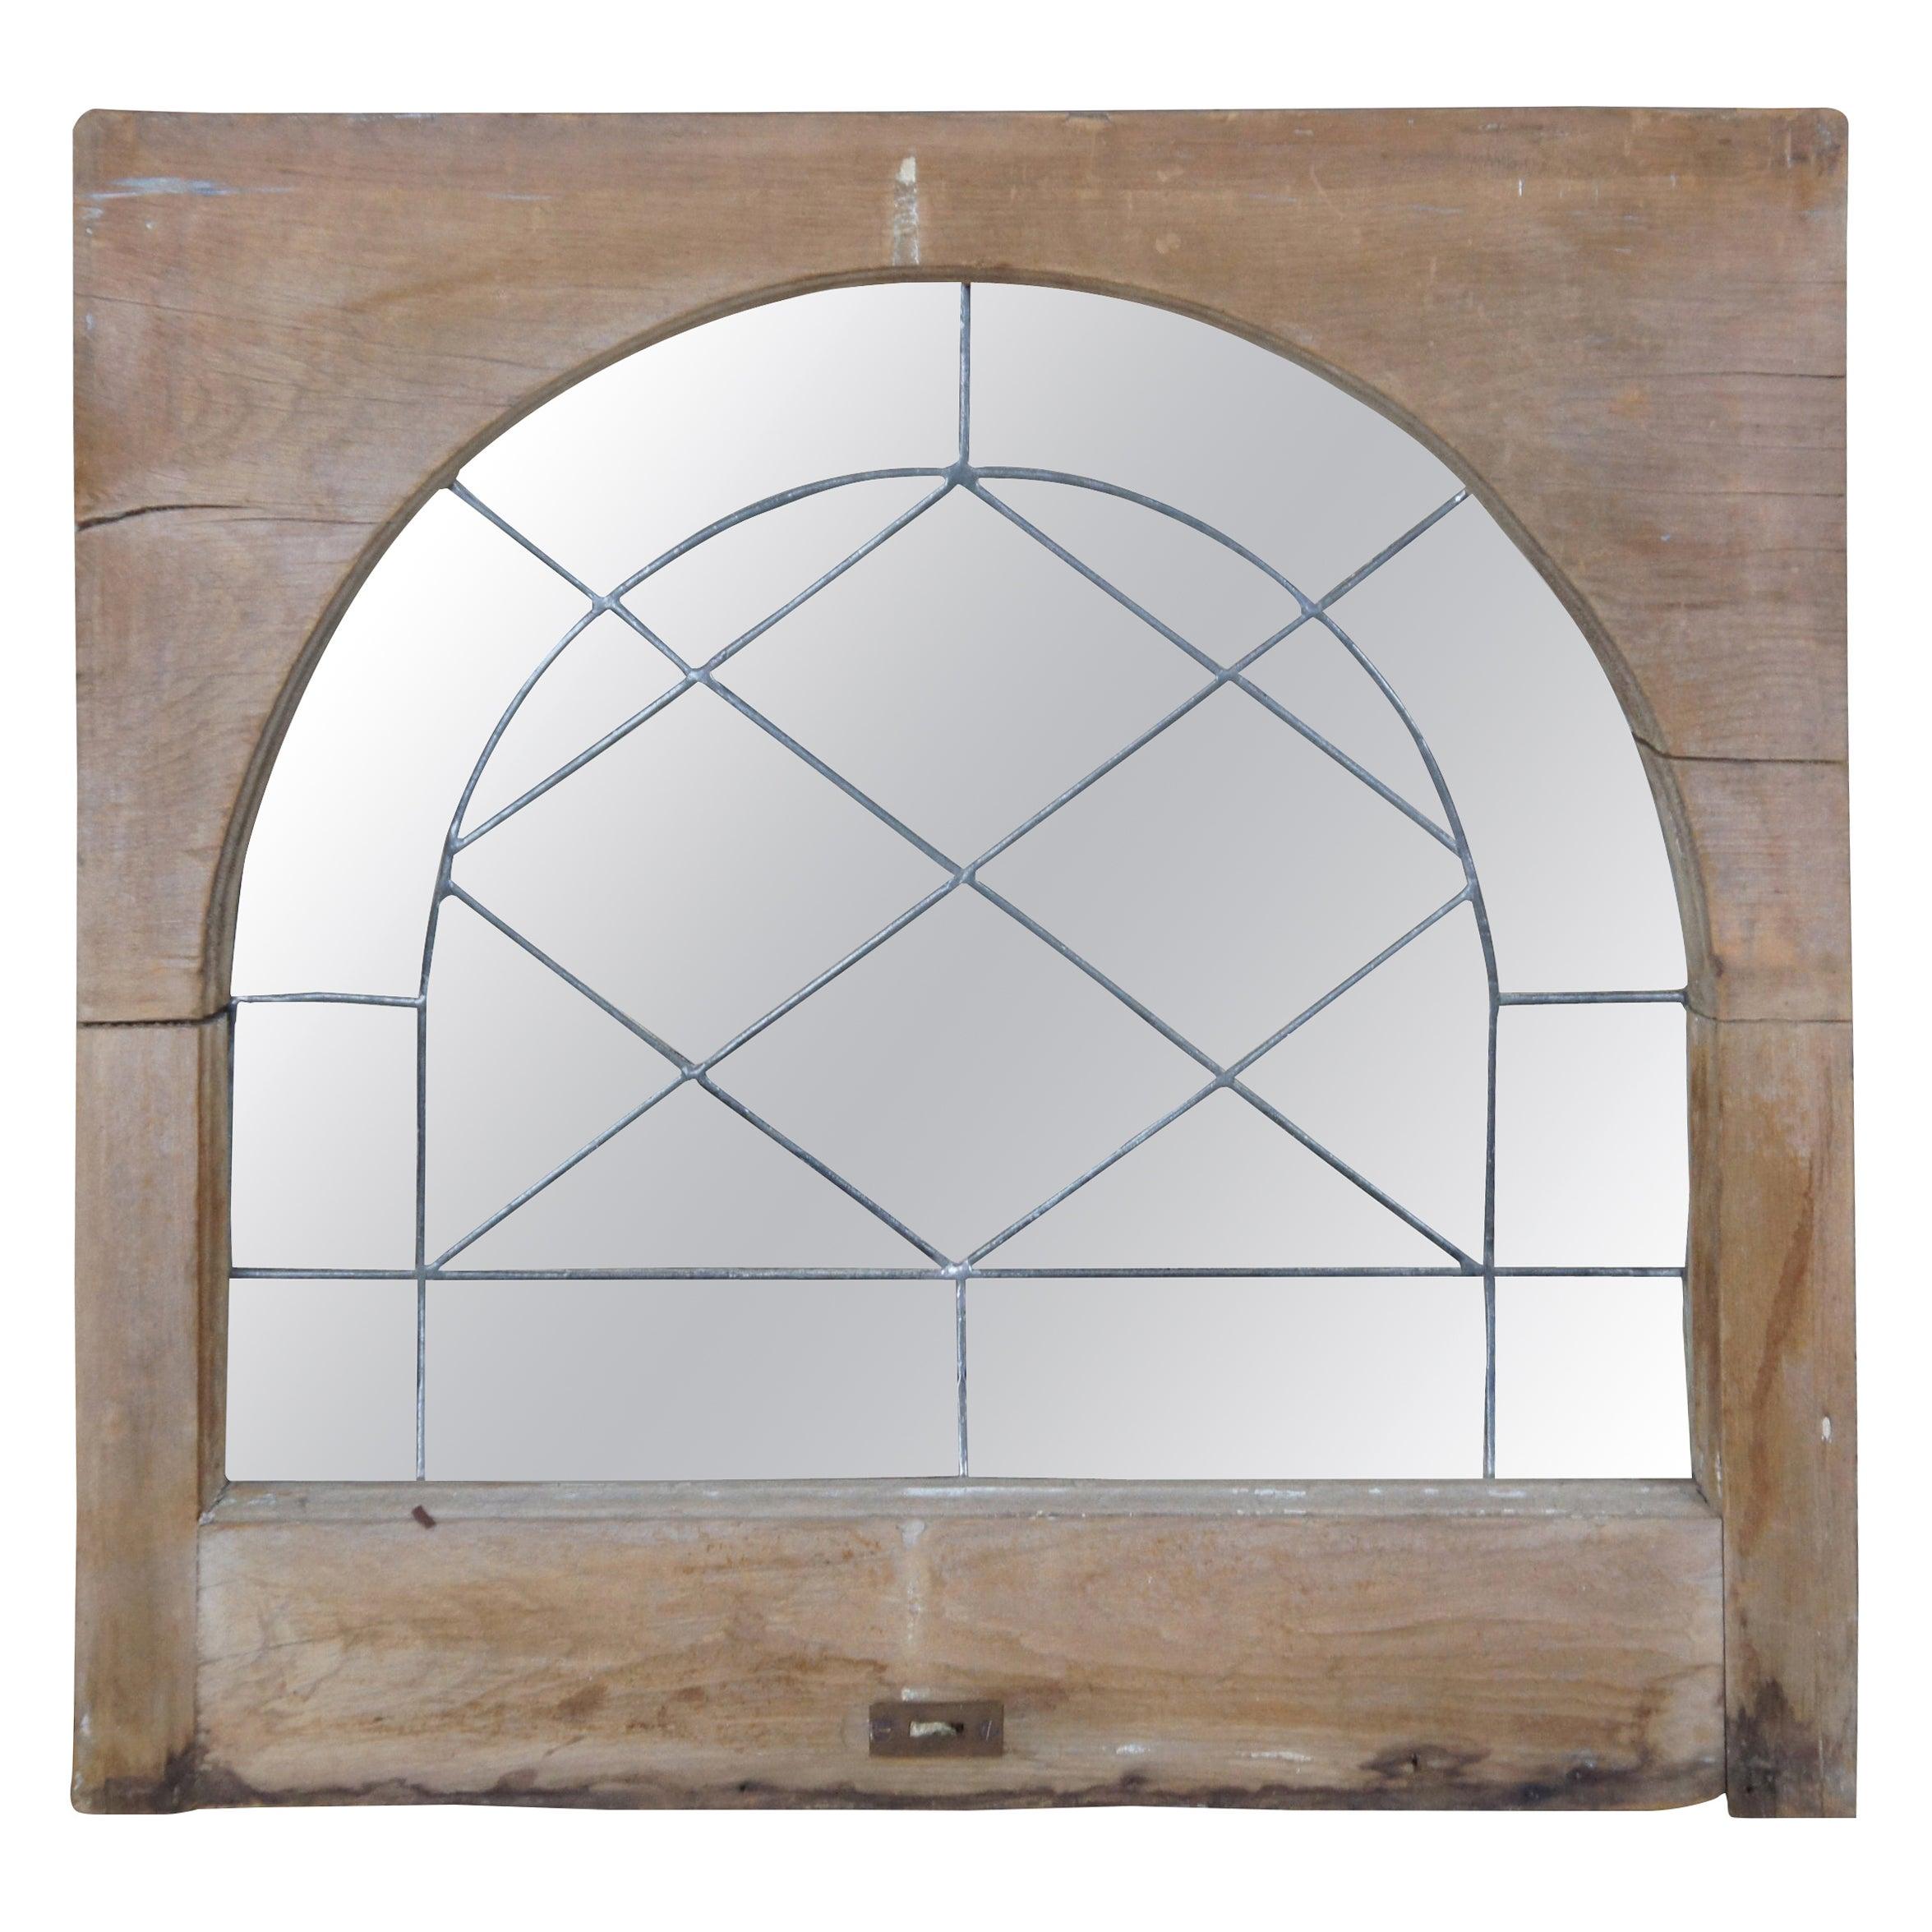 Antique Reclaimed Rectangular Leaded Glass Transom Window Insert Palladium